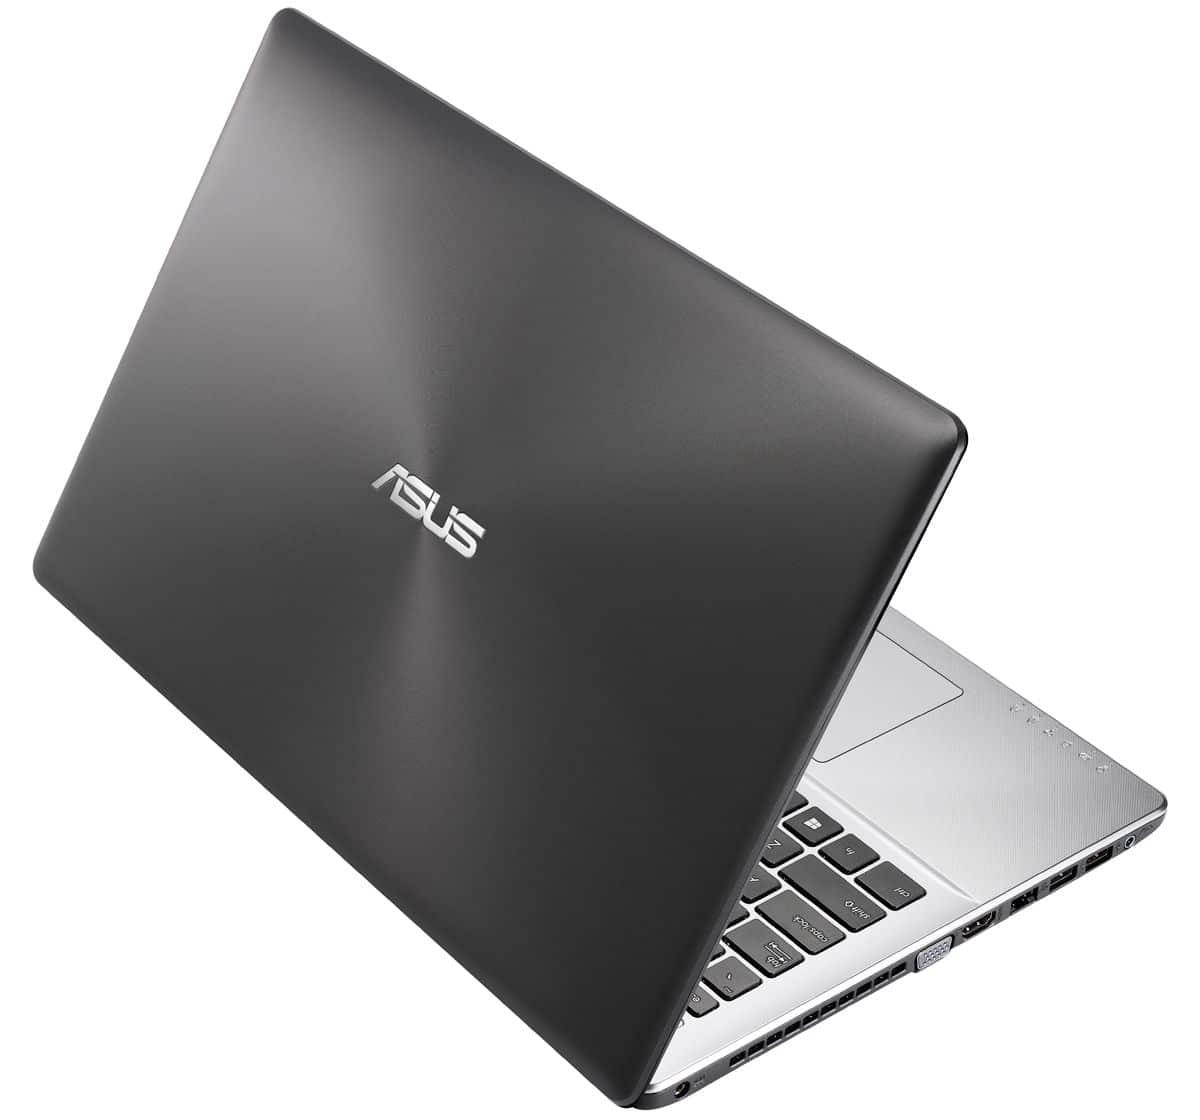 "Asus R510CC-XX483H à 589€, 15.6"" avec Core i5 Ivy Bridge, GT 720M, 1000 Go"